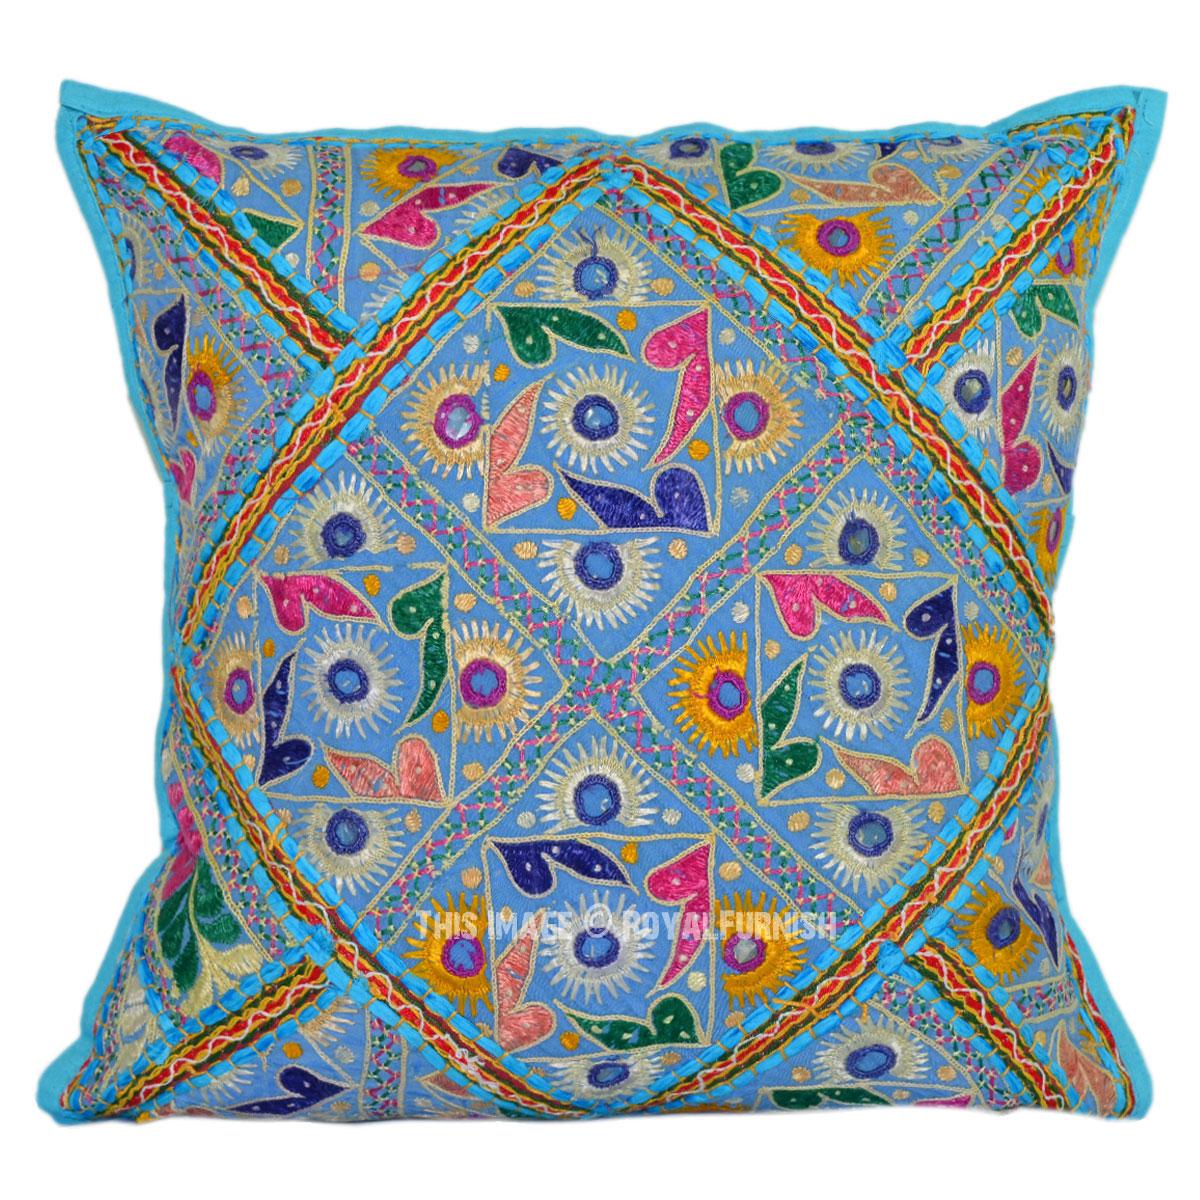 Turquoise Blue Decorative Vintage Tribal Boho Embroidered Toss Pillow - RoyalFurnish.com